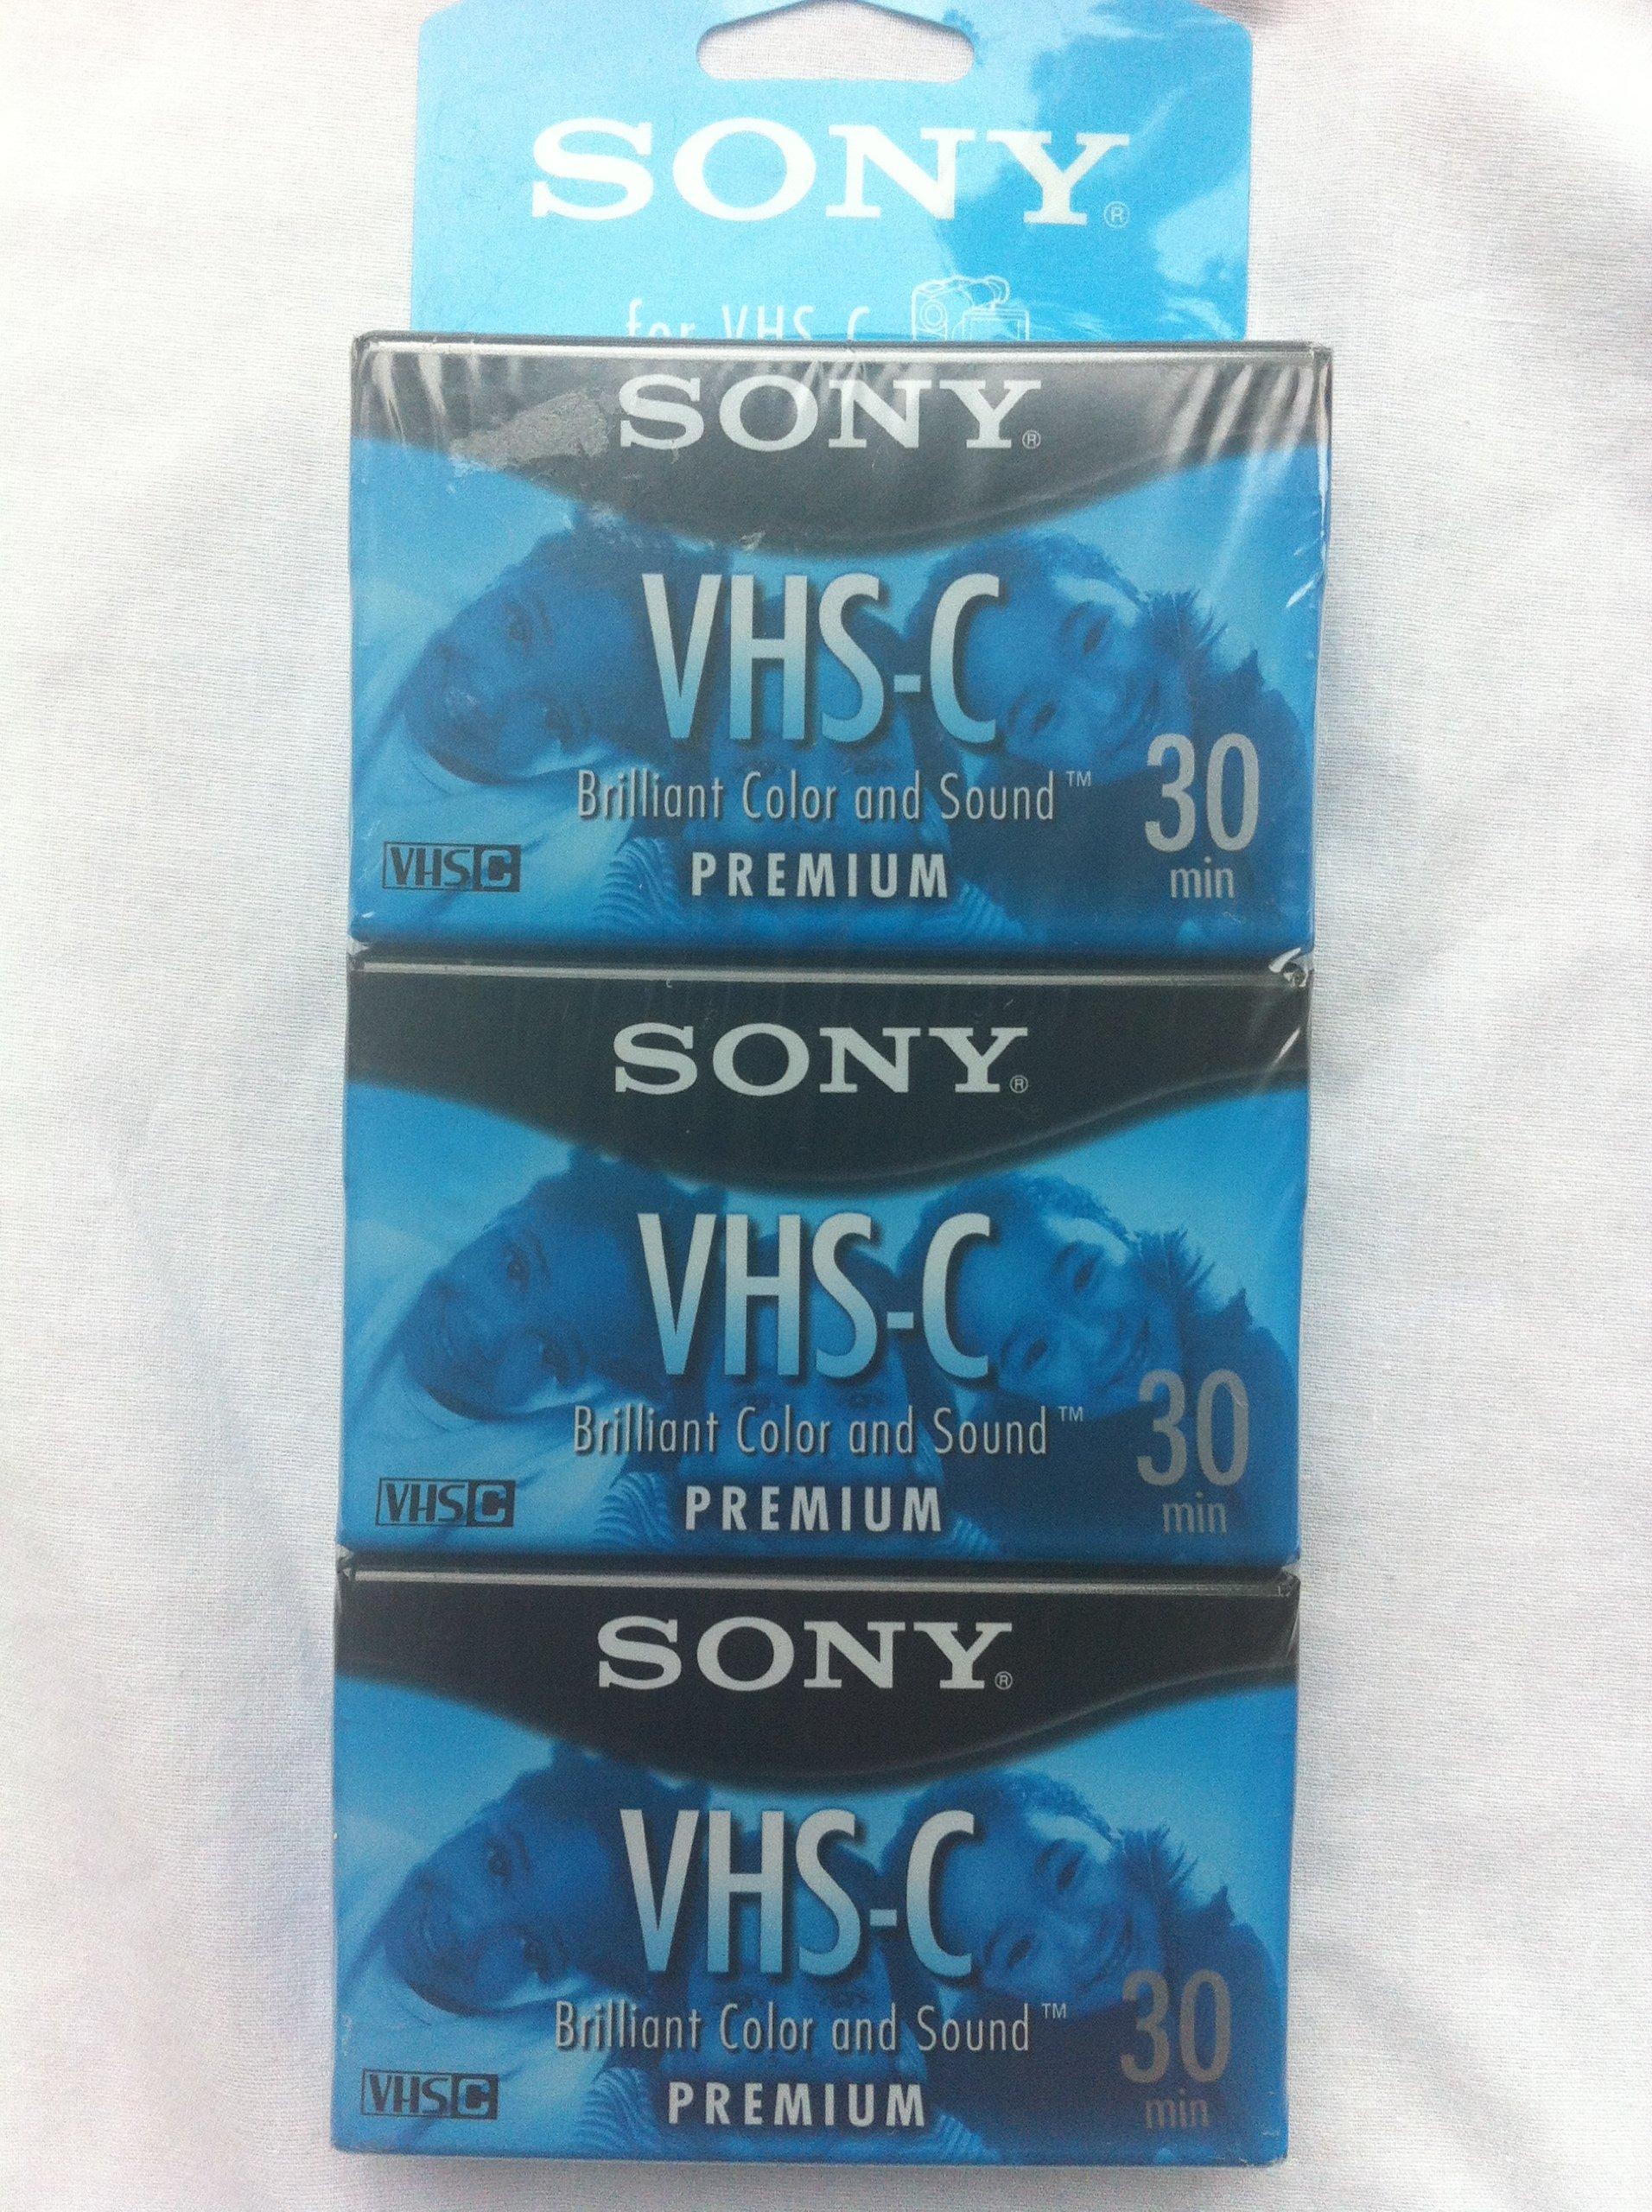 Sony VHS-C Premium 30 Min 3-Pack